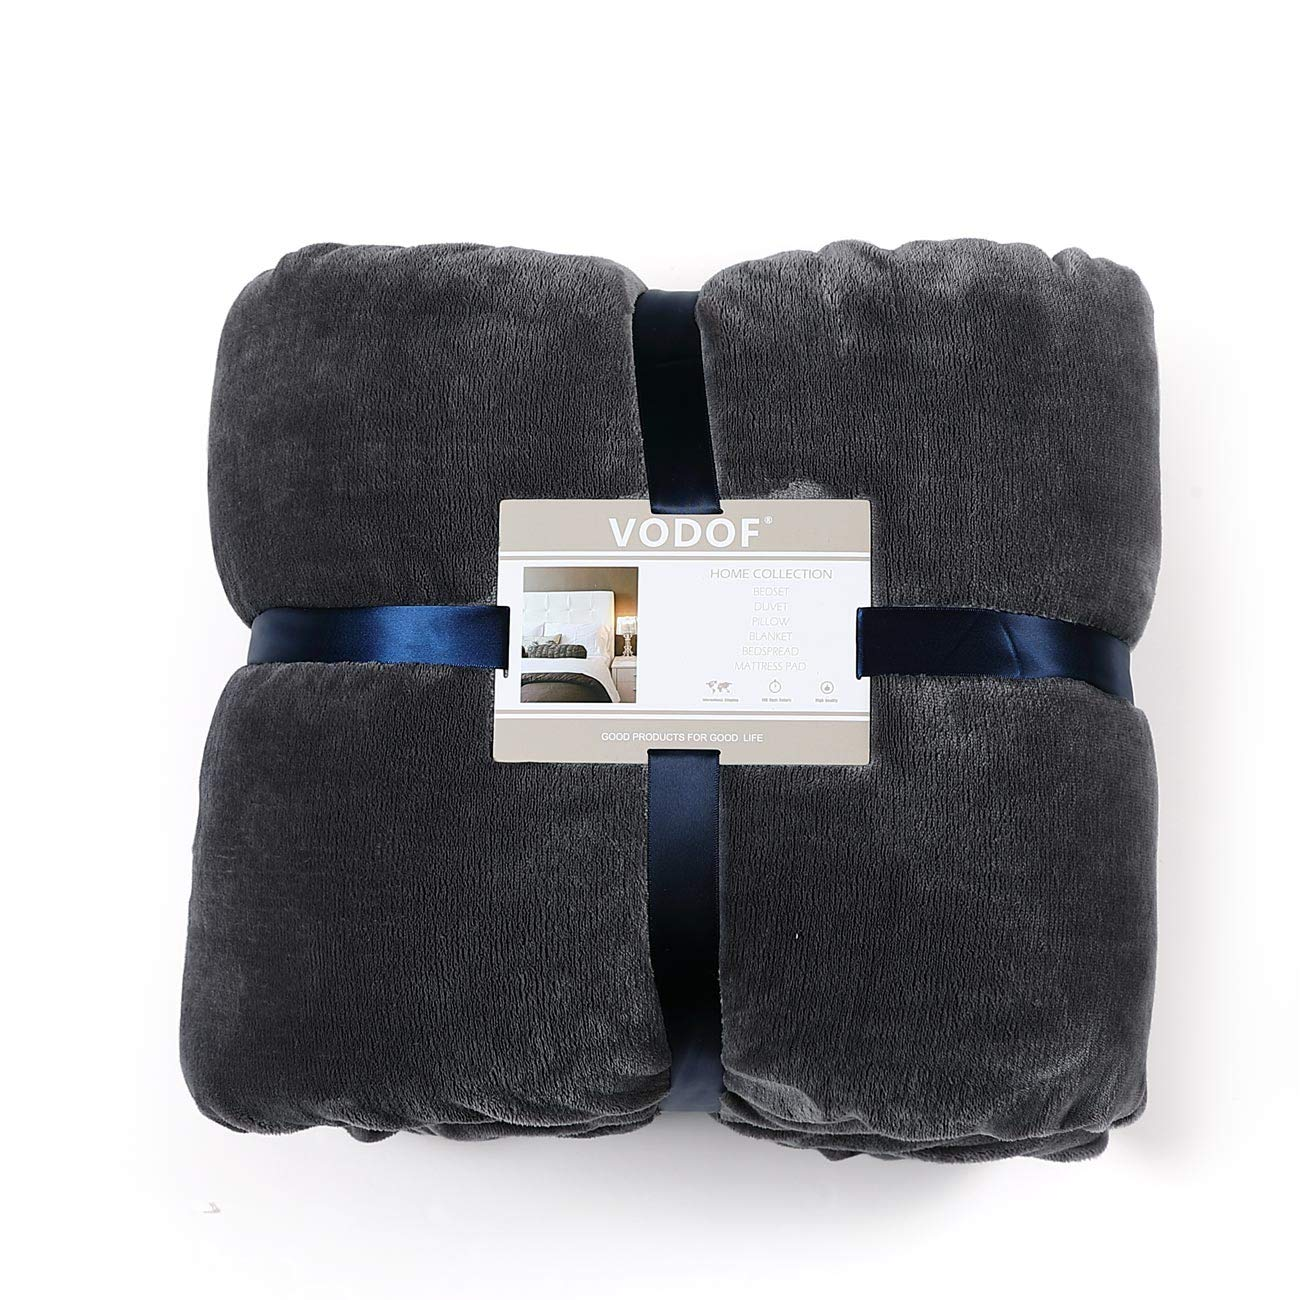 Gray-Pale Yellow, Queen VODOF Luxury Dark Grey Fleece Throw Blanket Bed Blanket Soft Double-Sided Blanket 90x90 in Queen Size Couch Blanket for All Season